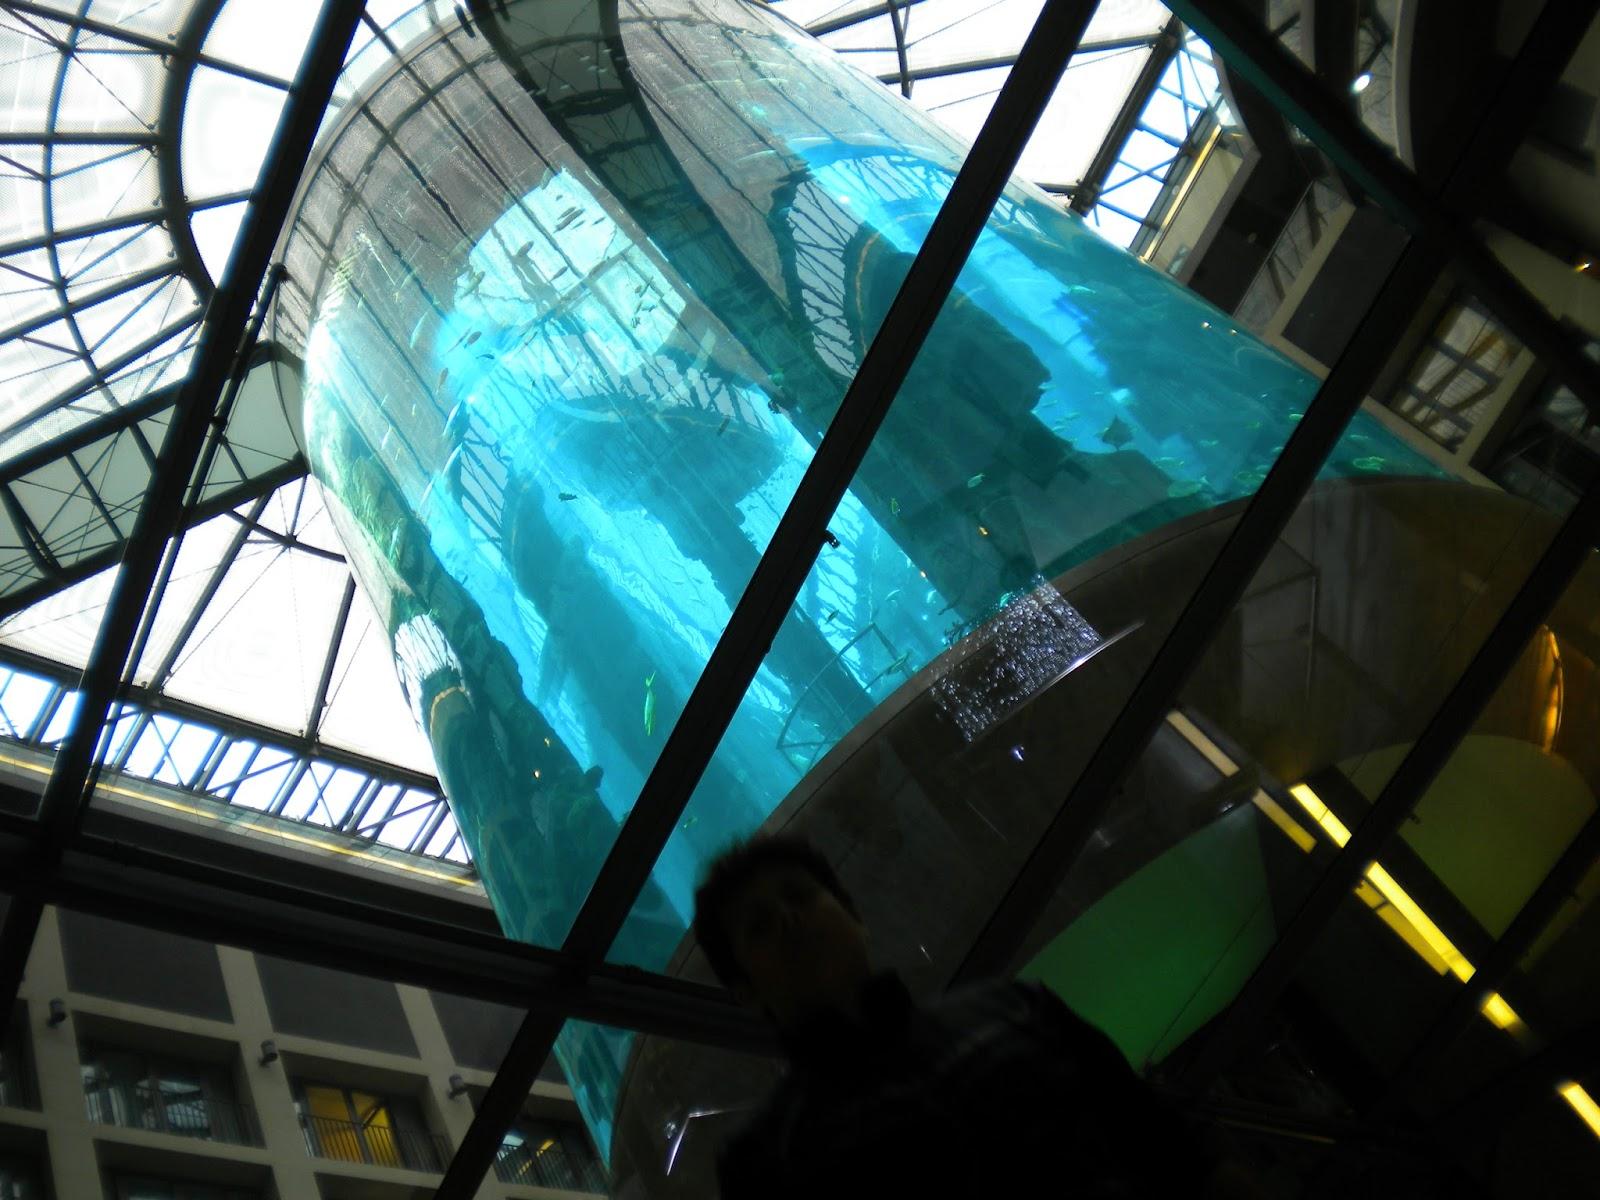 AquaDom - Berlin